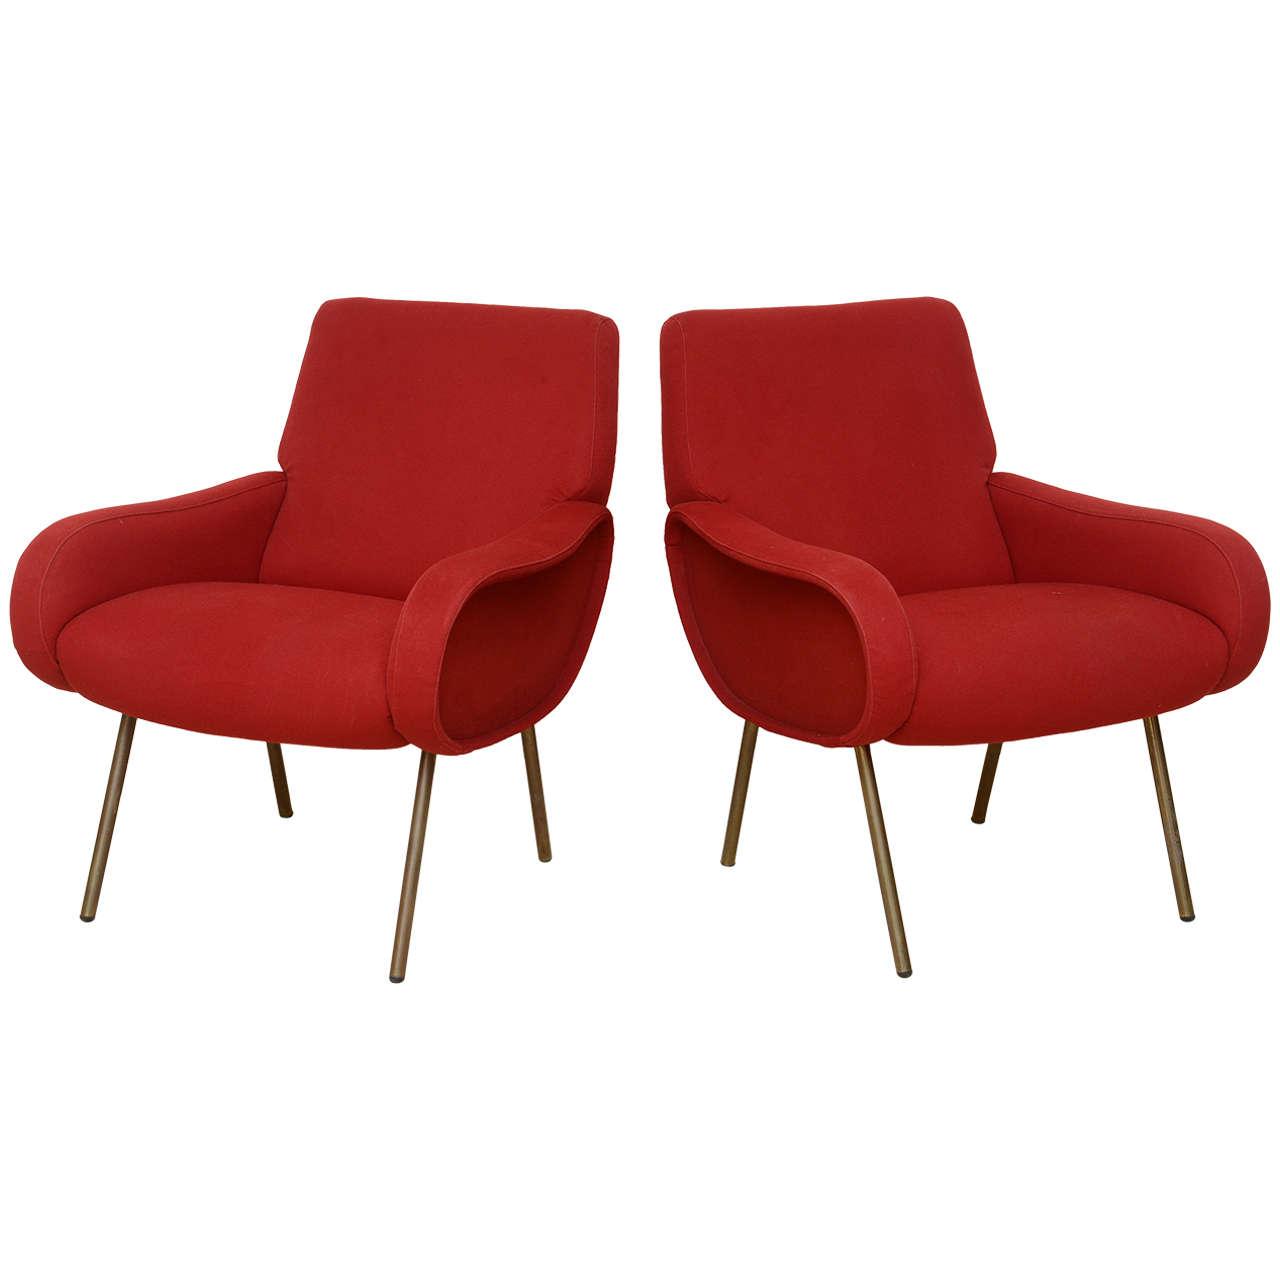 Pair of Italian Modern Armchairs, Marco Zanuso For Sale